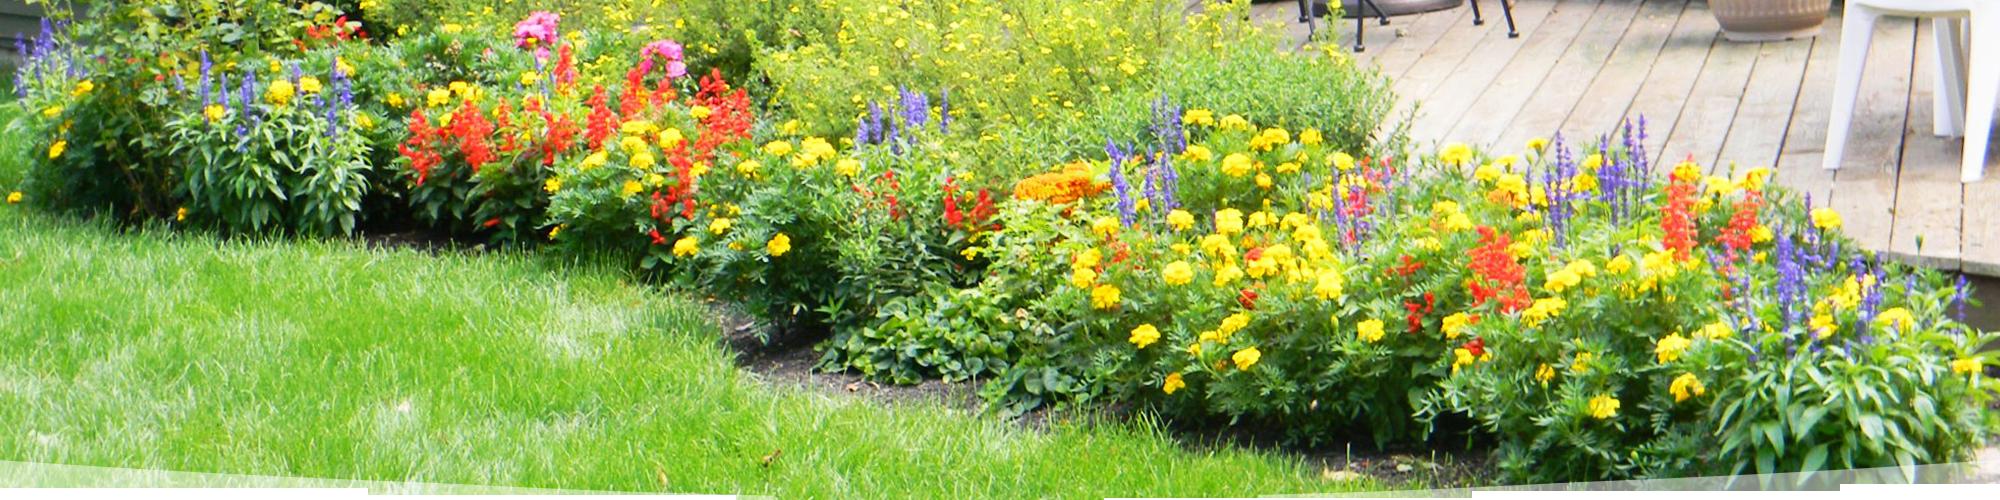 Garden Design Questionnaire gardening | landscaping design, planting & maintenance | michigan